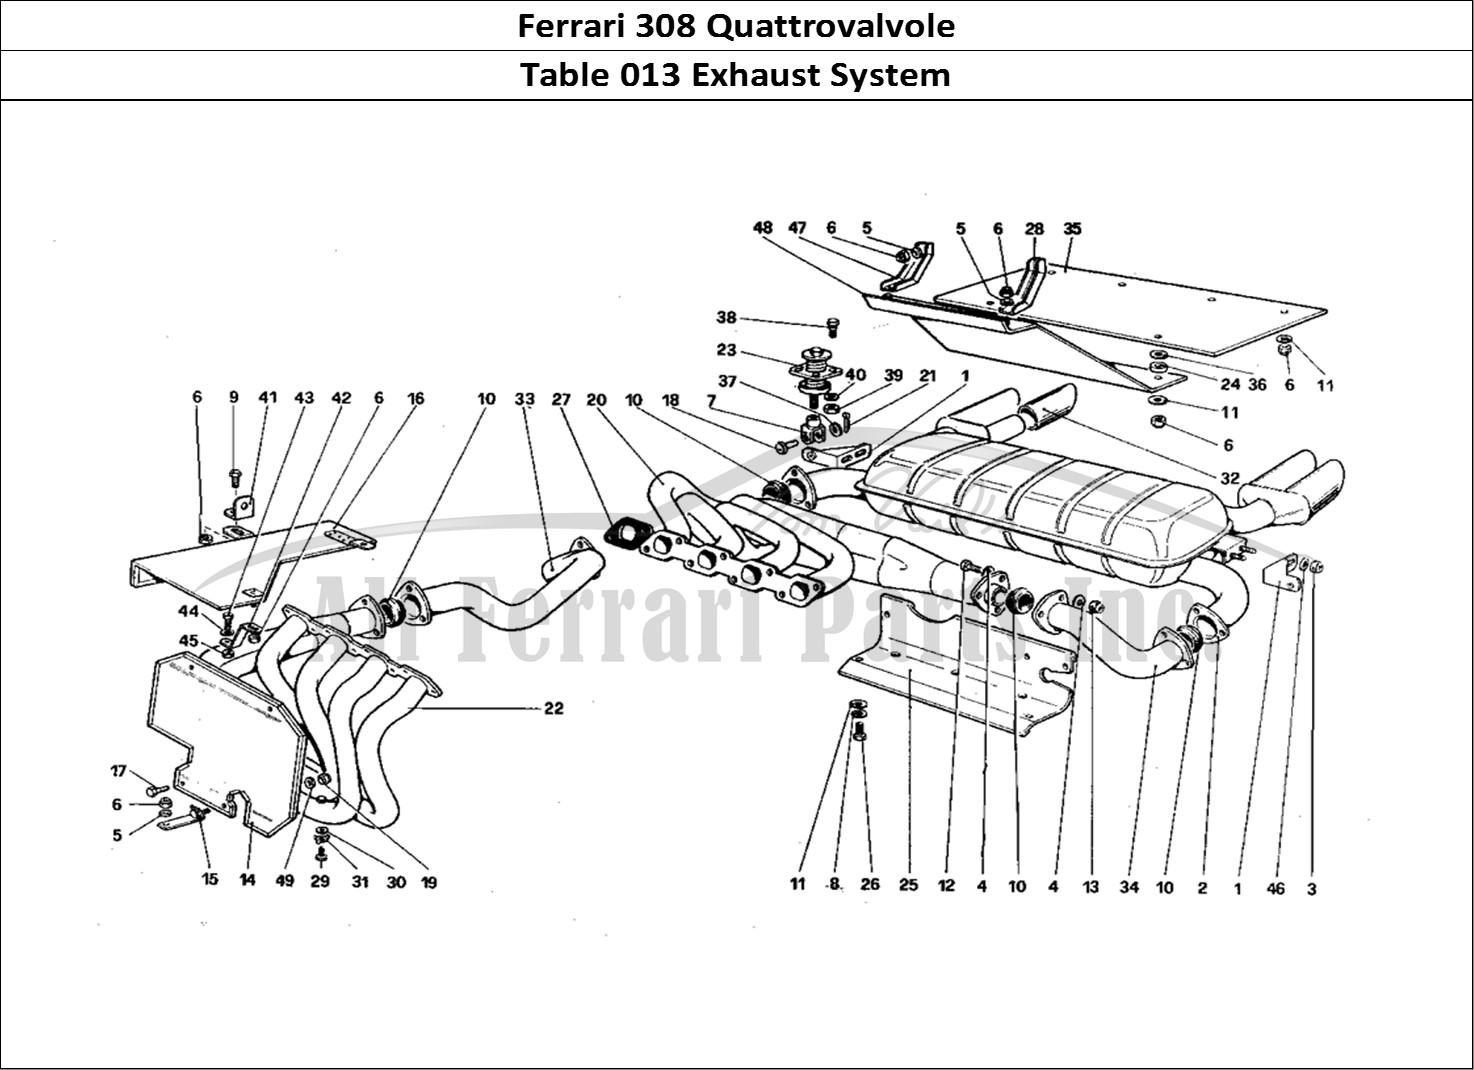 ferrari 308 quattrovalvole mechanical table 013 exhaust system